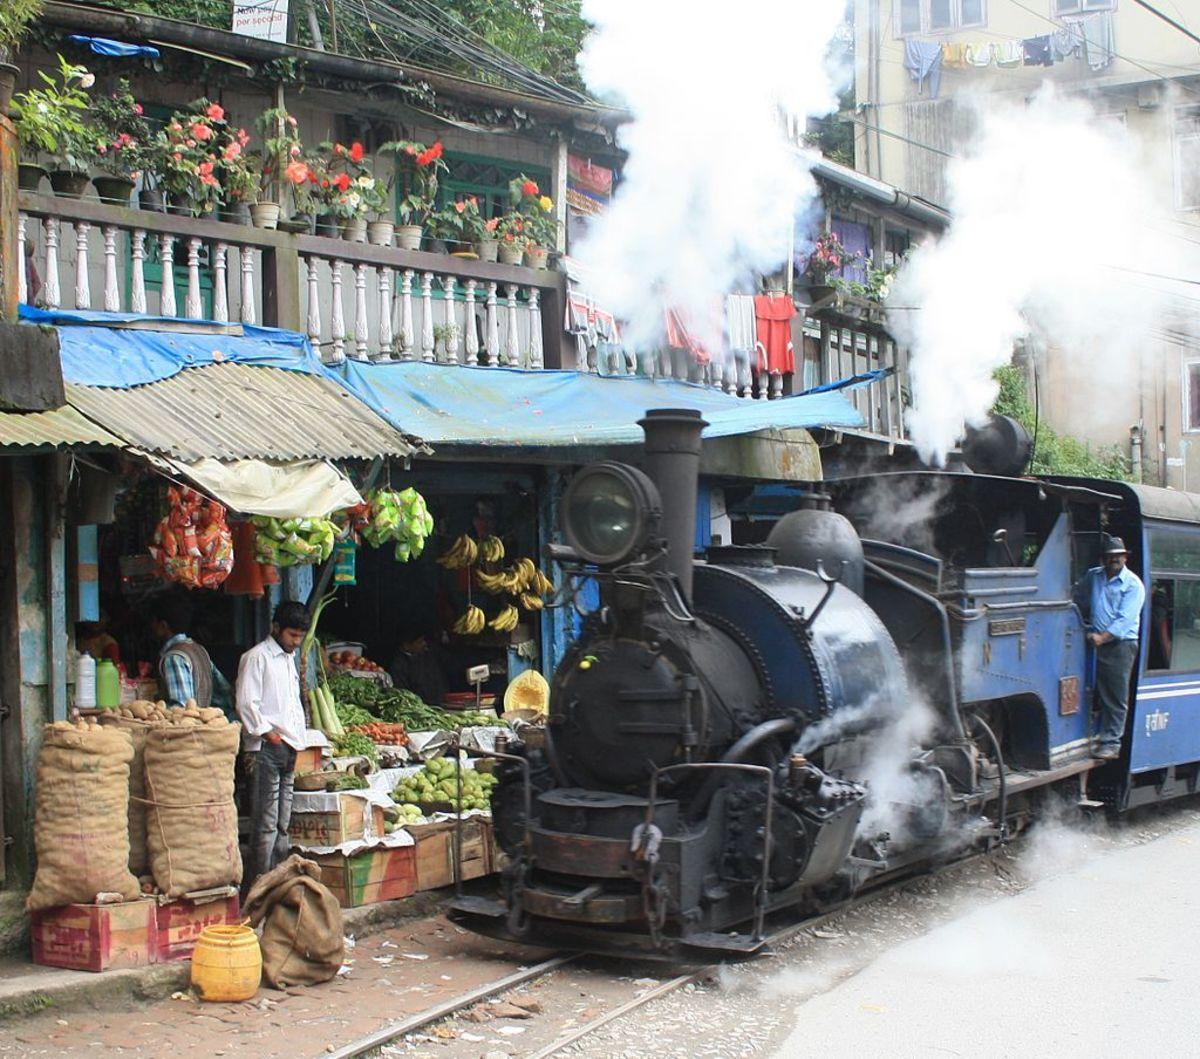 The darjeeling rail crosses close to shops